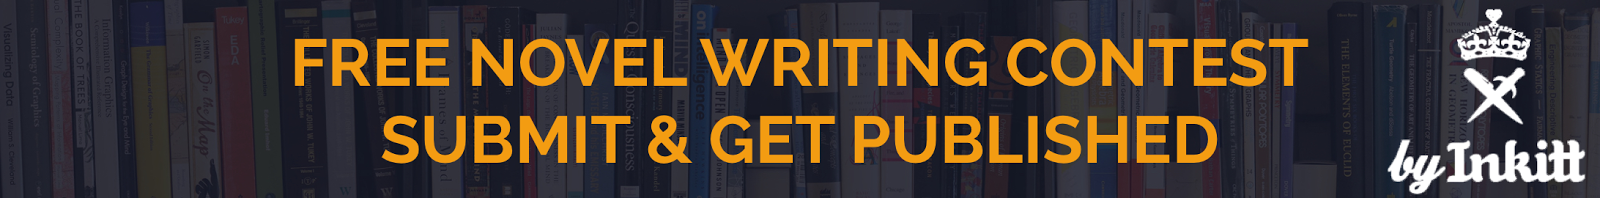 novel writing contests